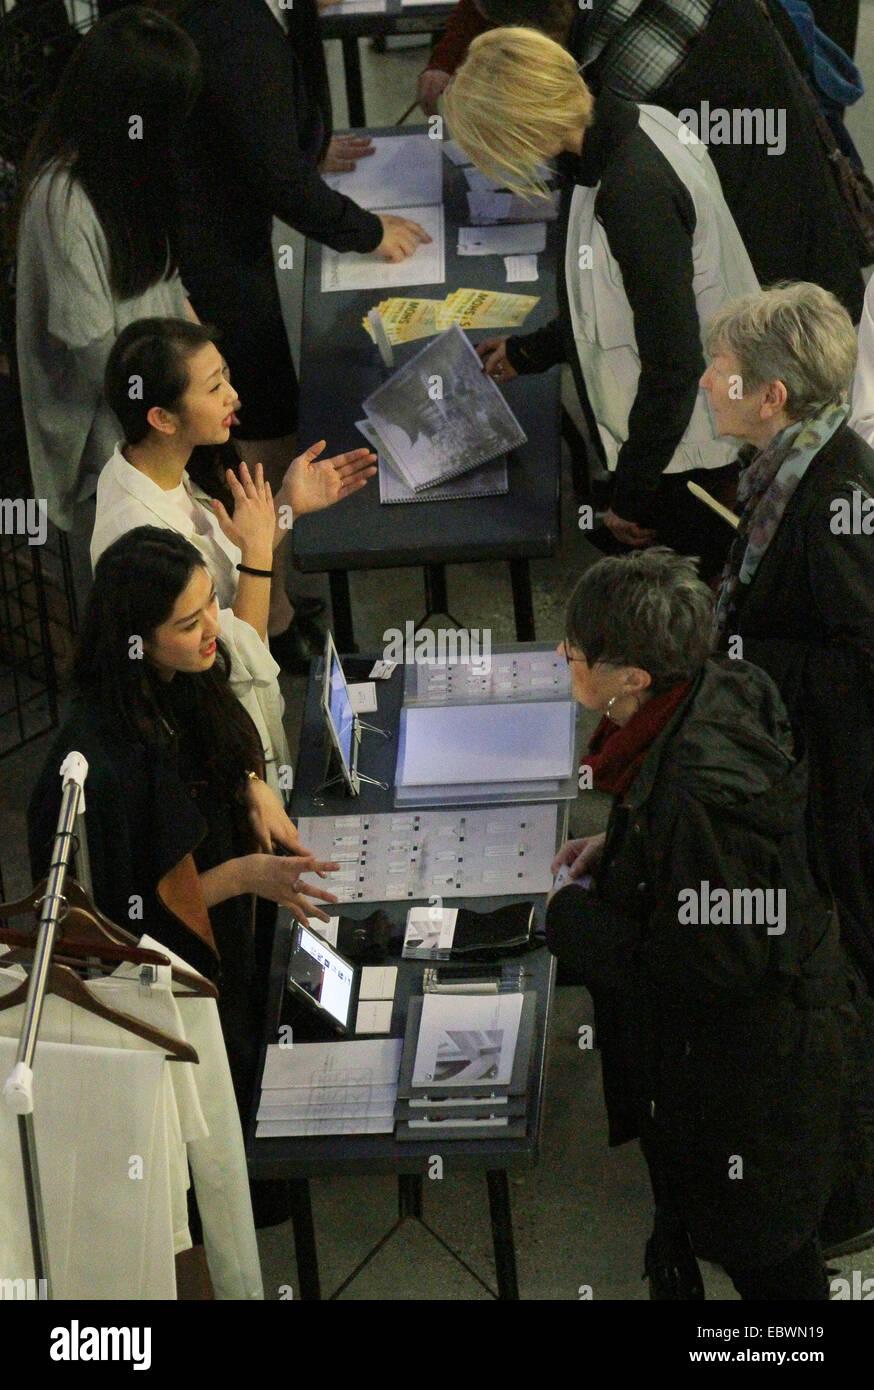 Vancouver Canada 4th Dec 2014 Fashion Design Students Present Stock Photo Alamy